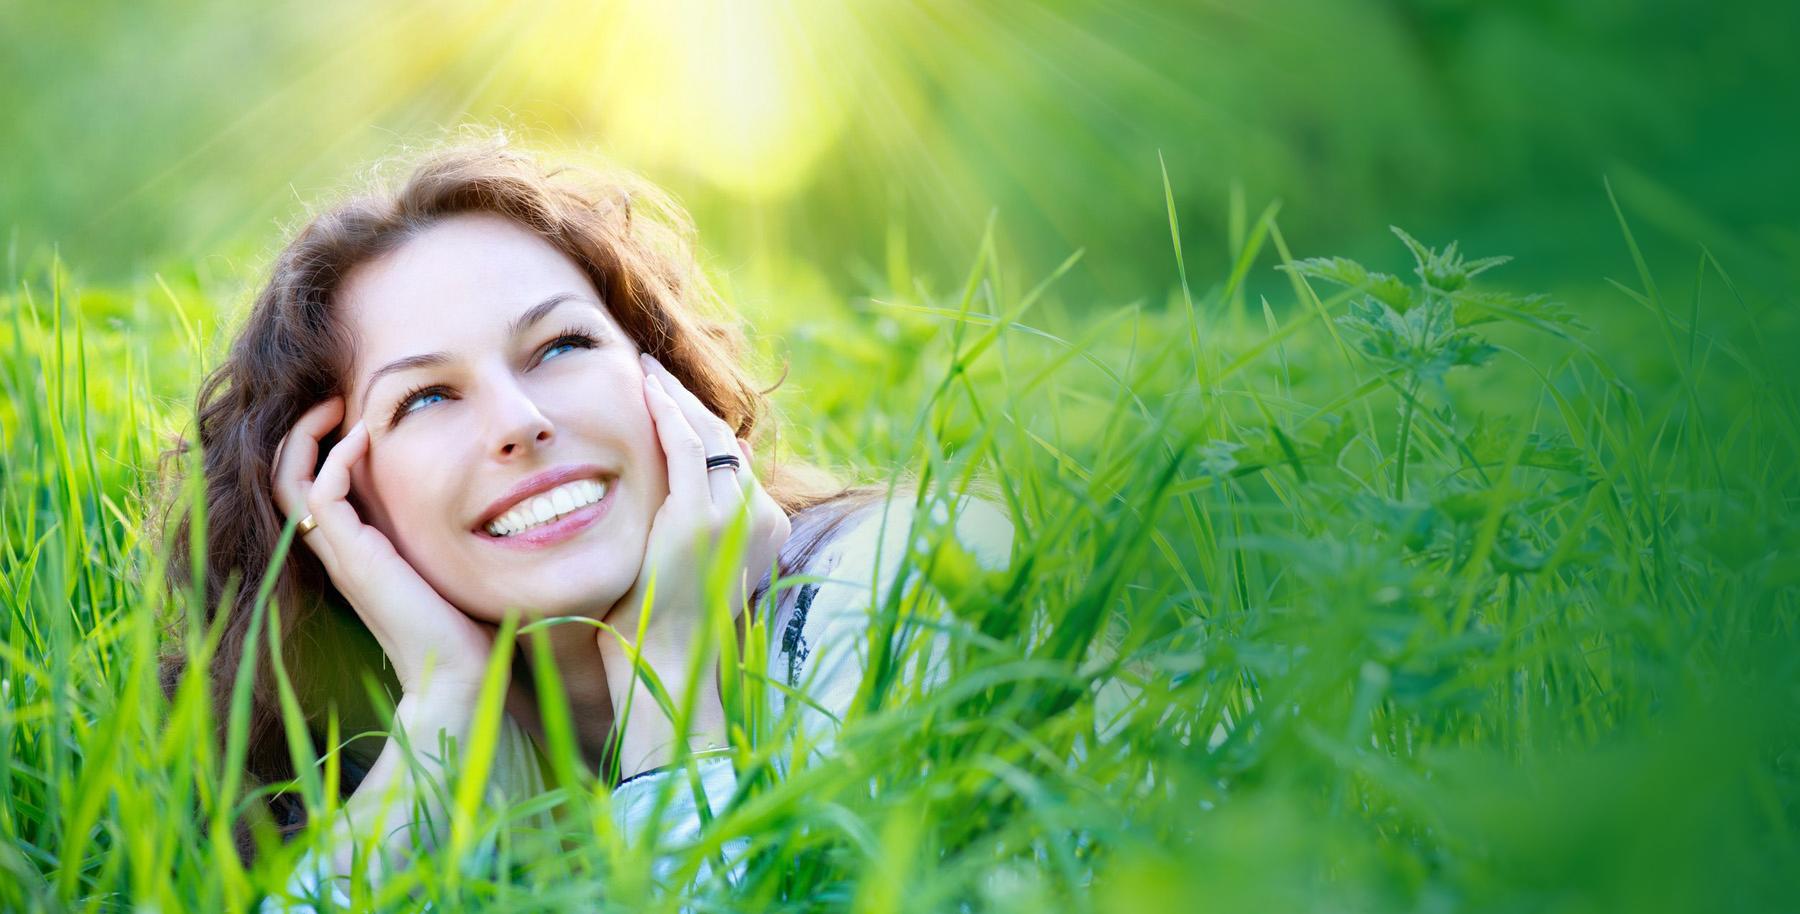 girl-in-grass-edited